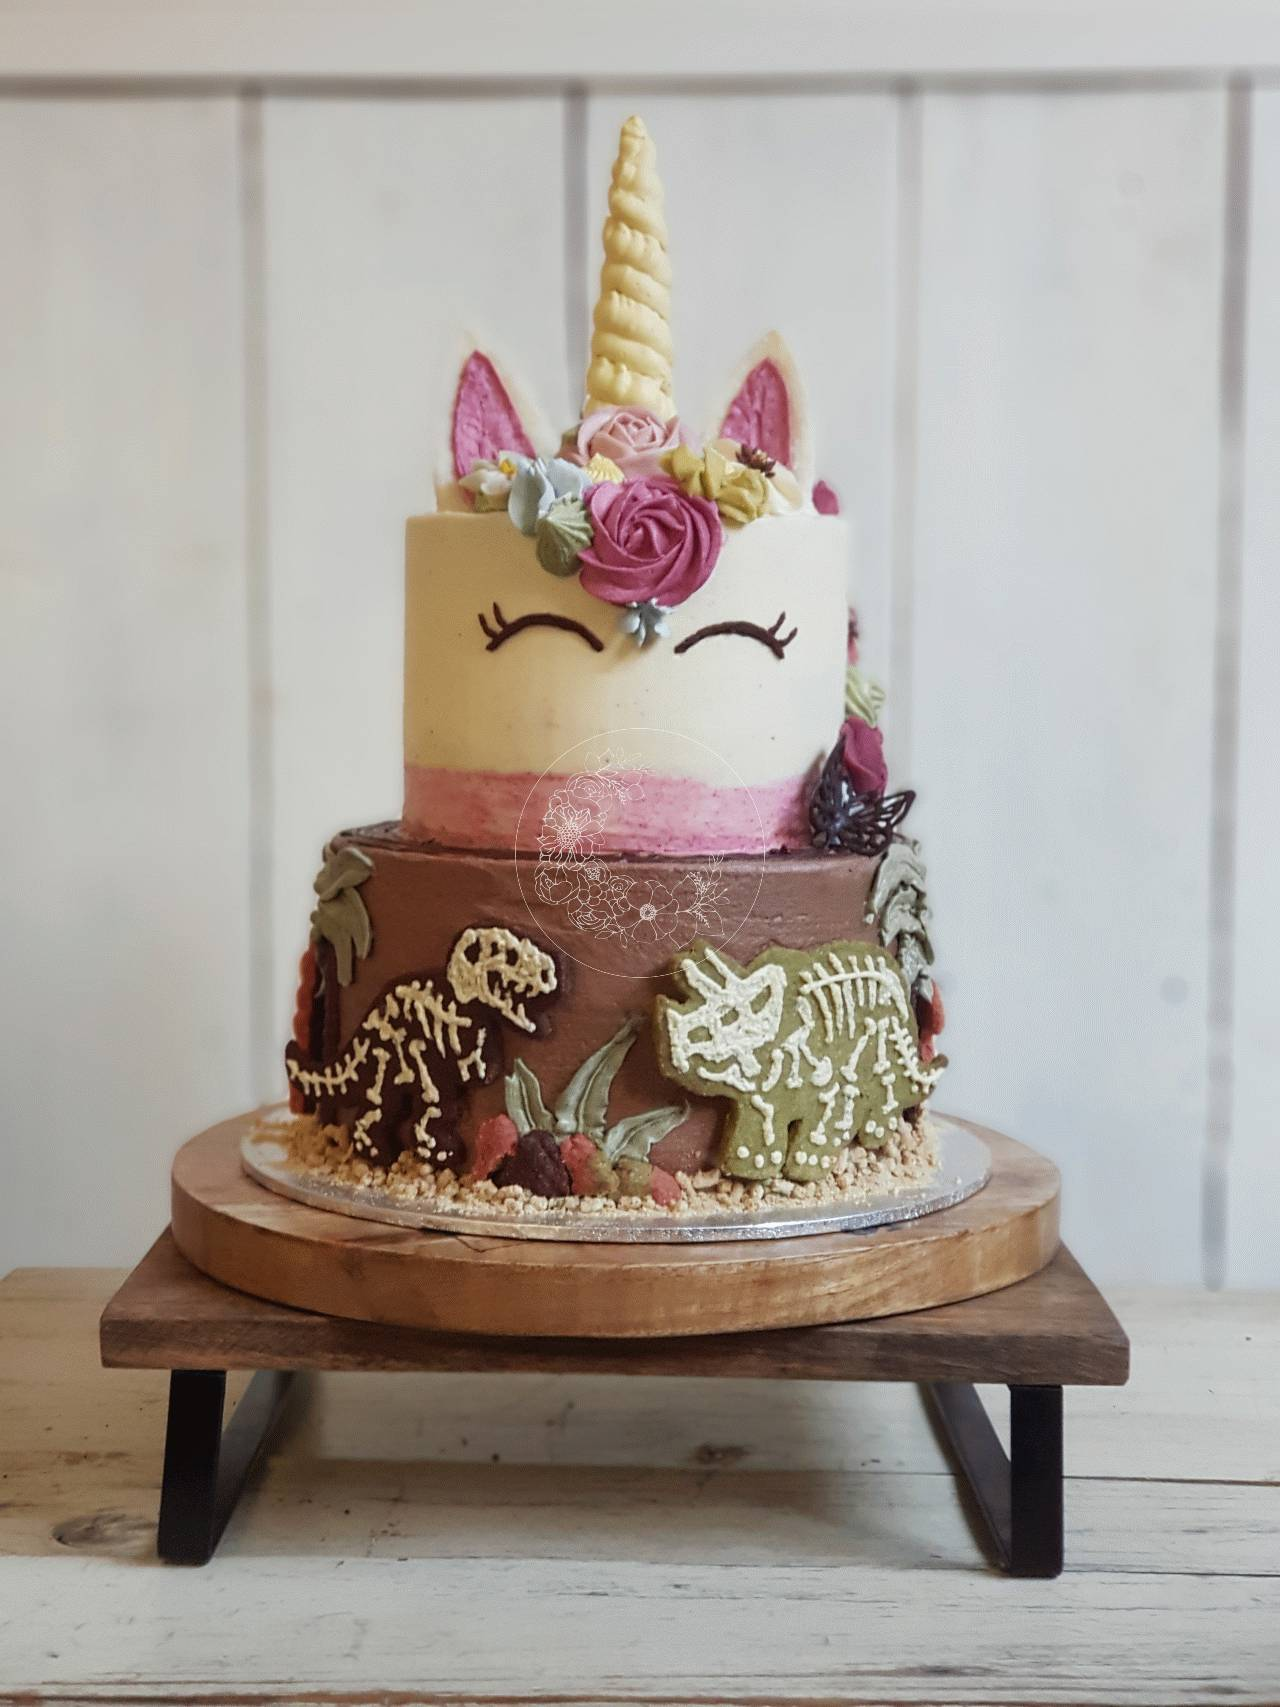 Dinosaur Unicorn Tier Cake Bloominghills